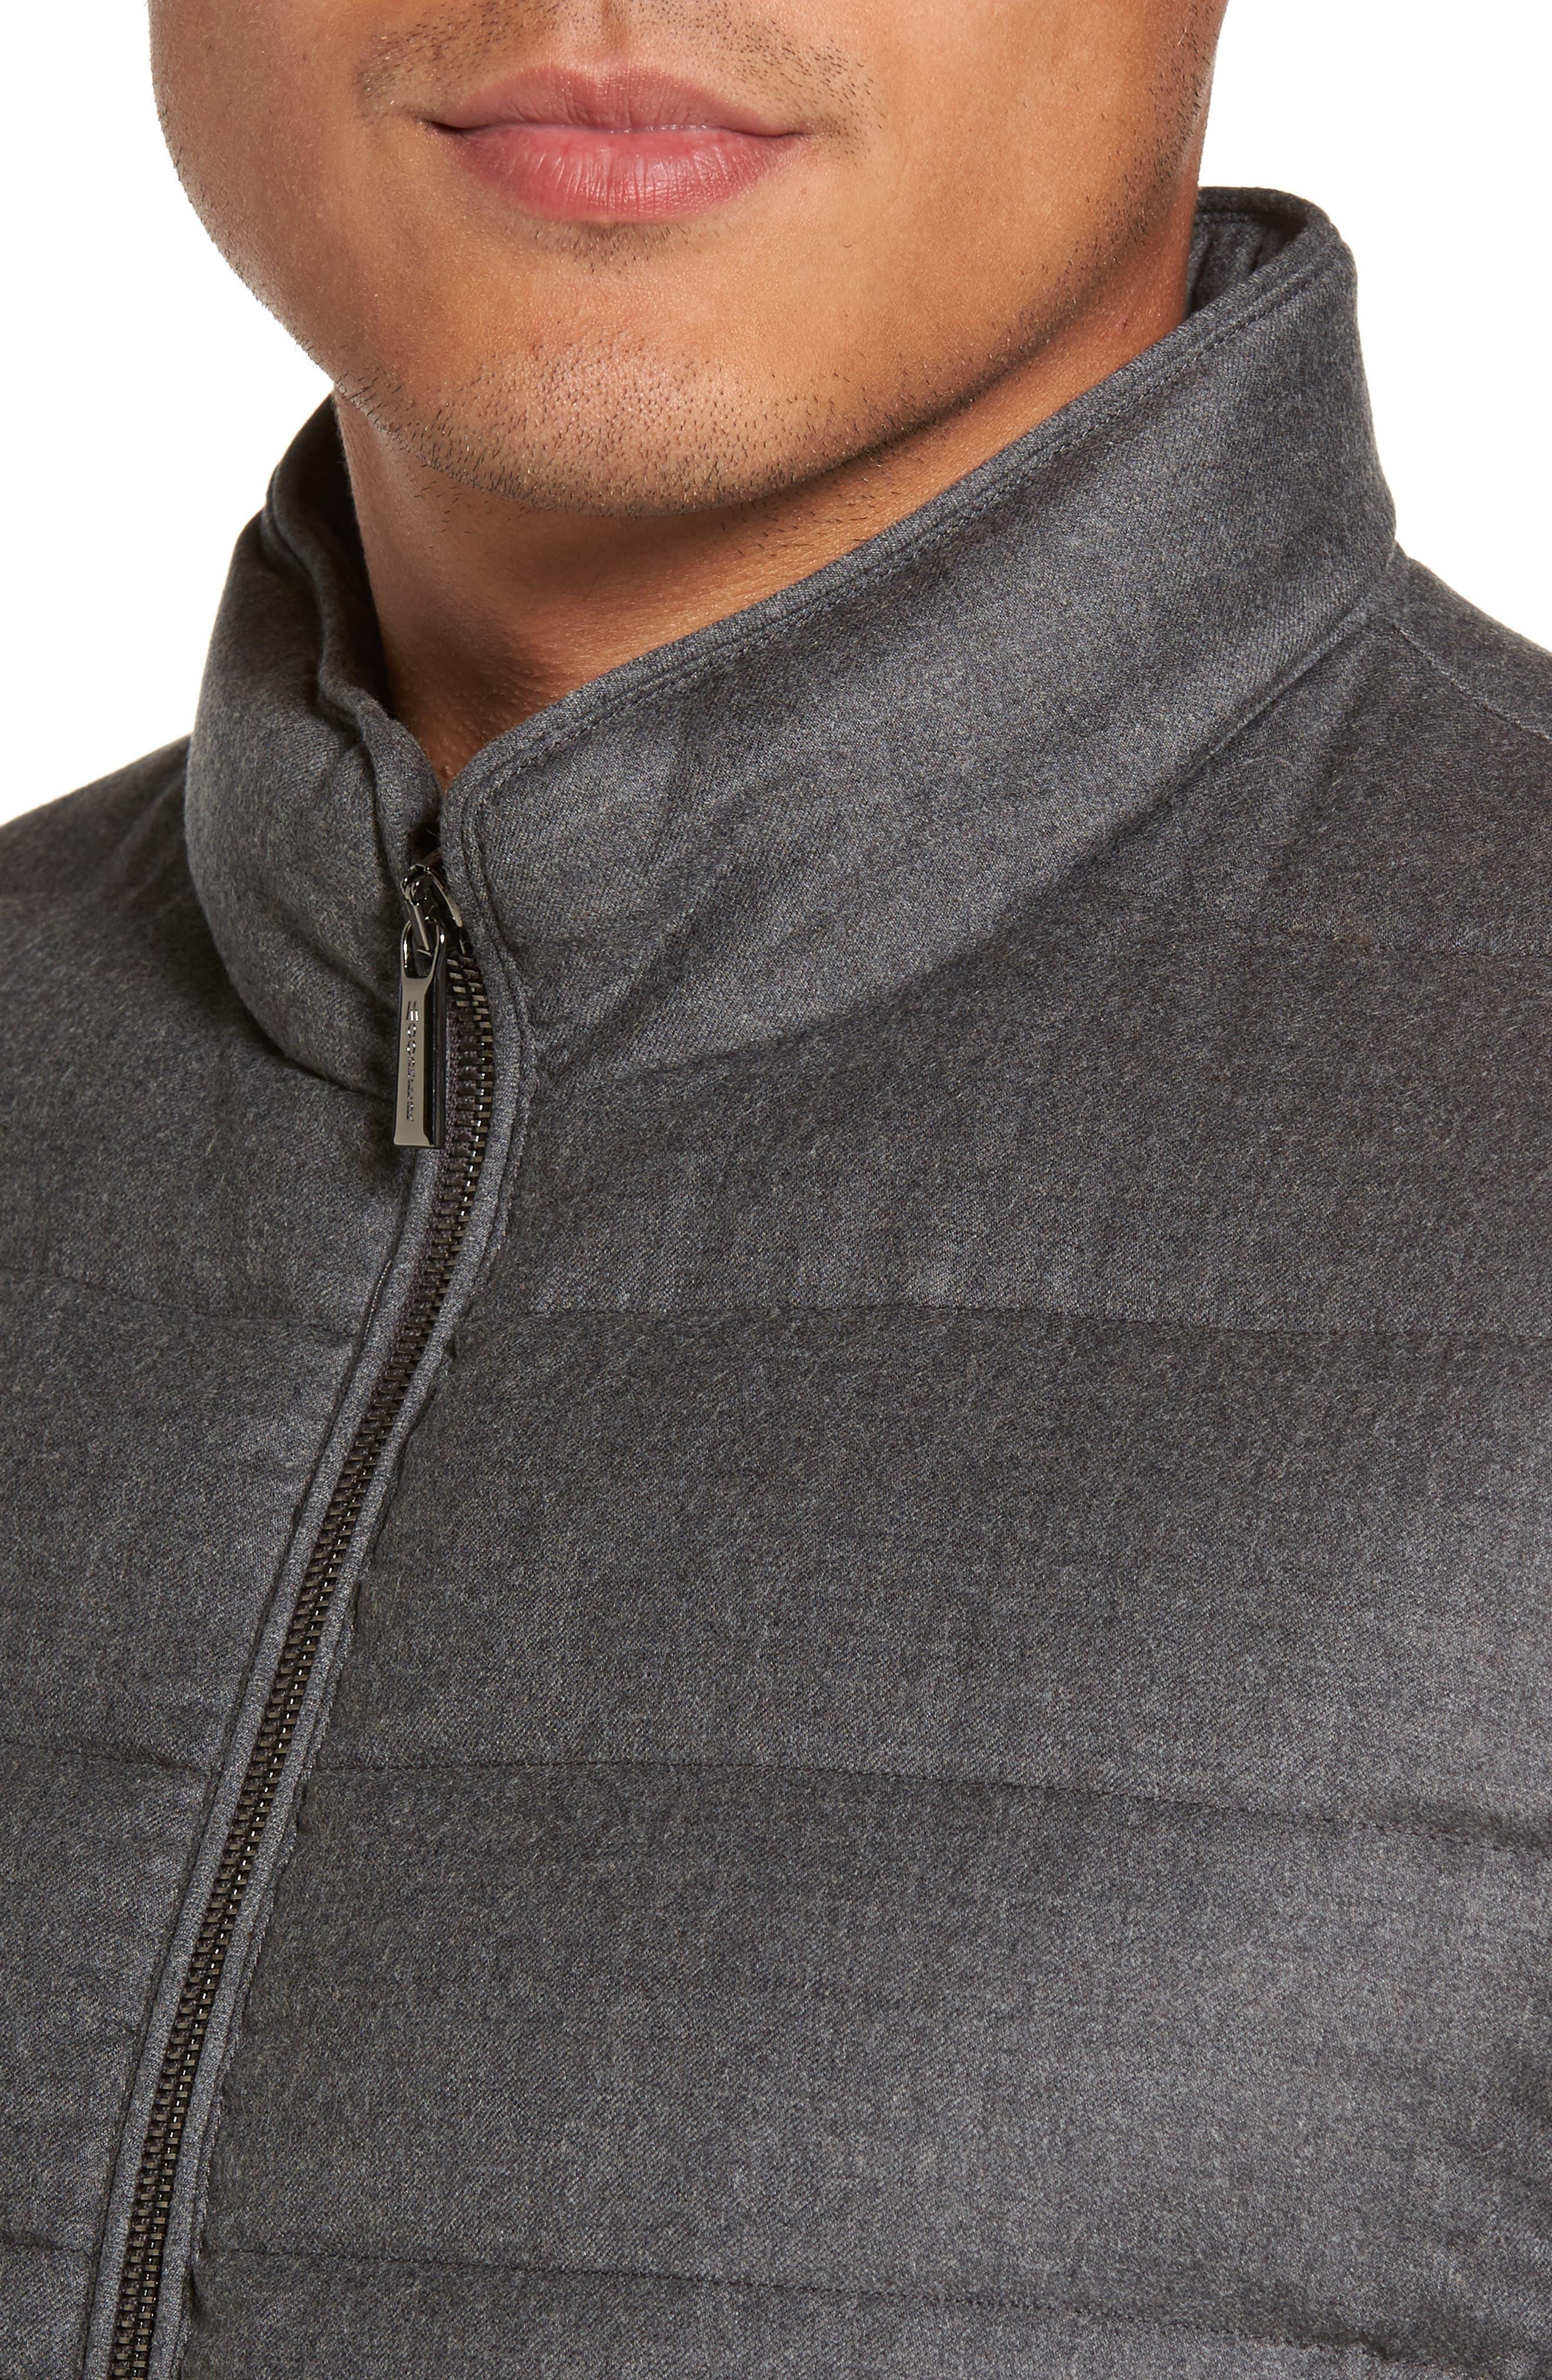 Oliver L Wool & Cashmere Flannel Waterproof Vest,                             Alternate thumbnail 4, color,                             030